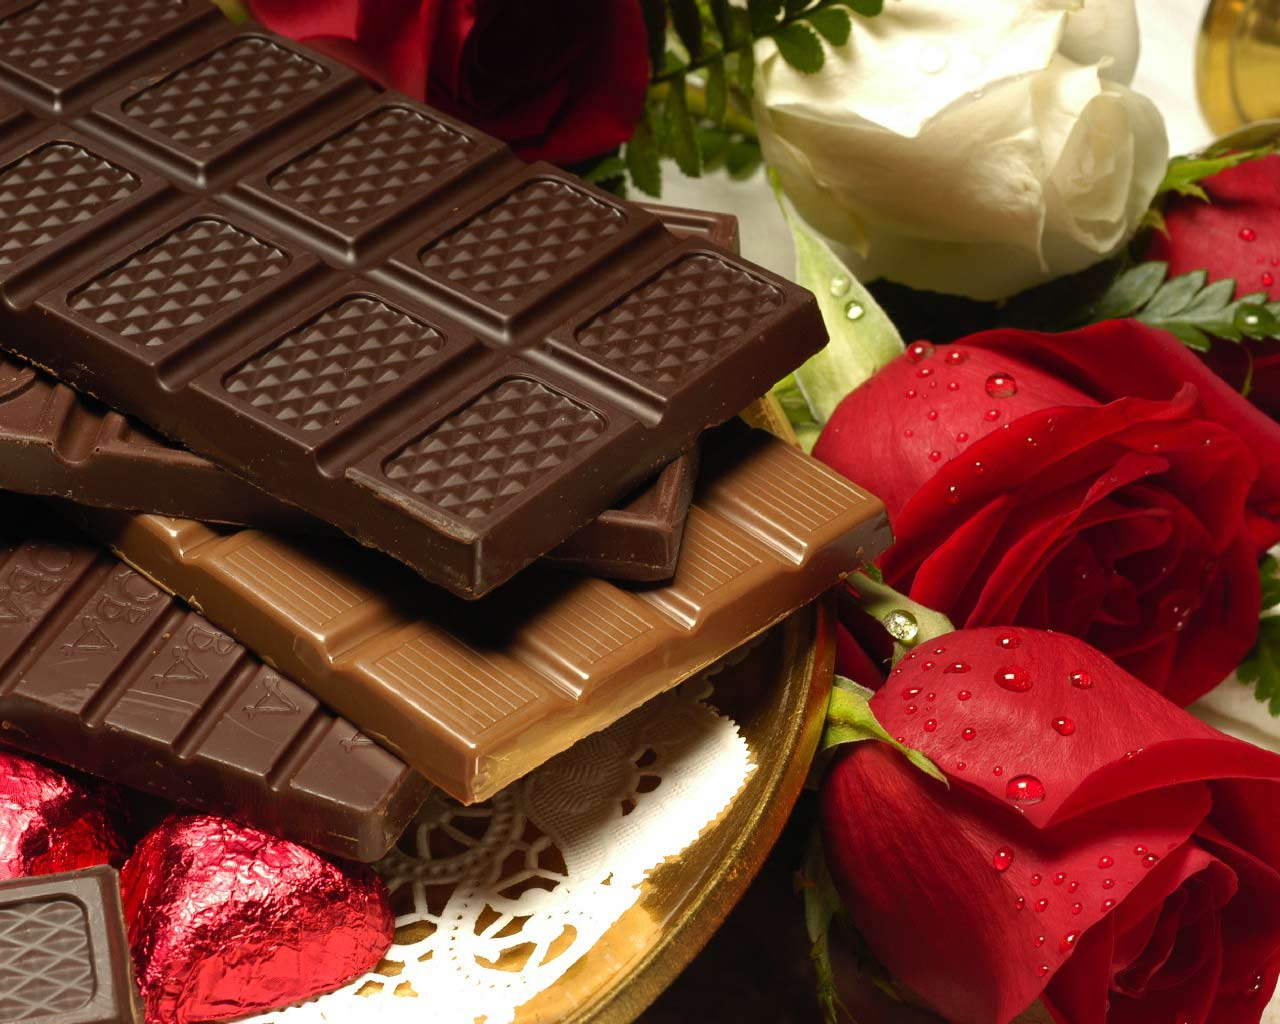 Valentine Chocolate Wallpaper IPhone Wallpaper WallpaperLepi 1280x1024